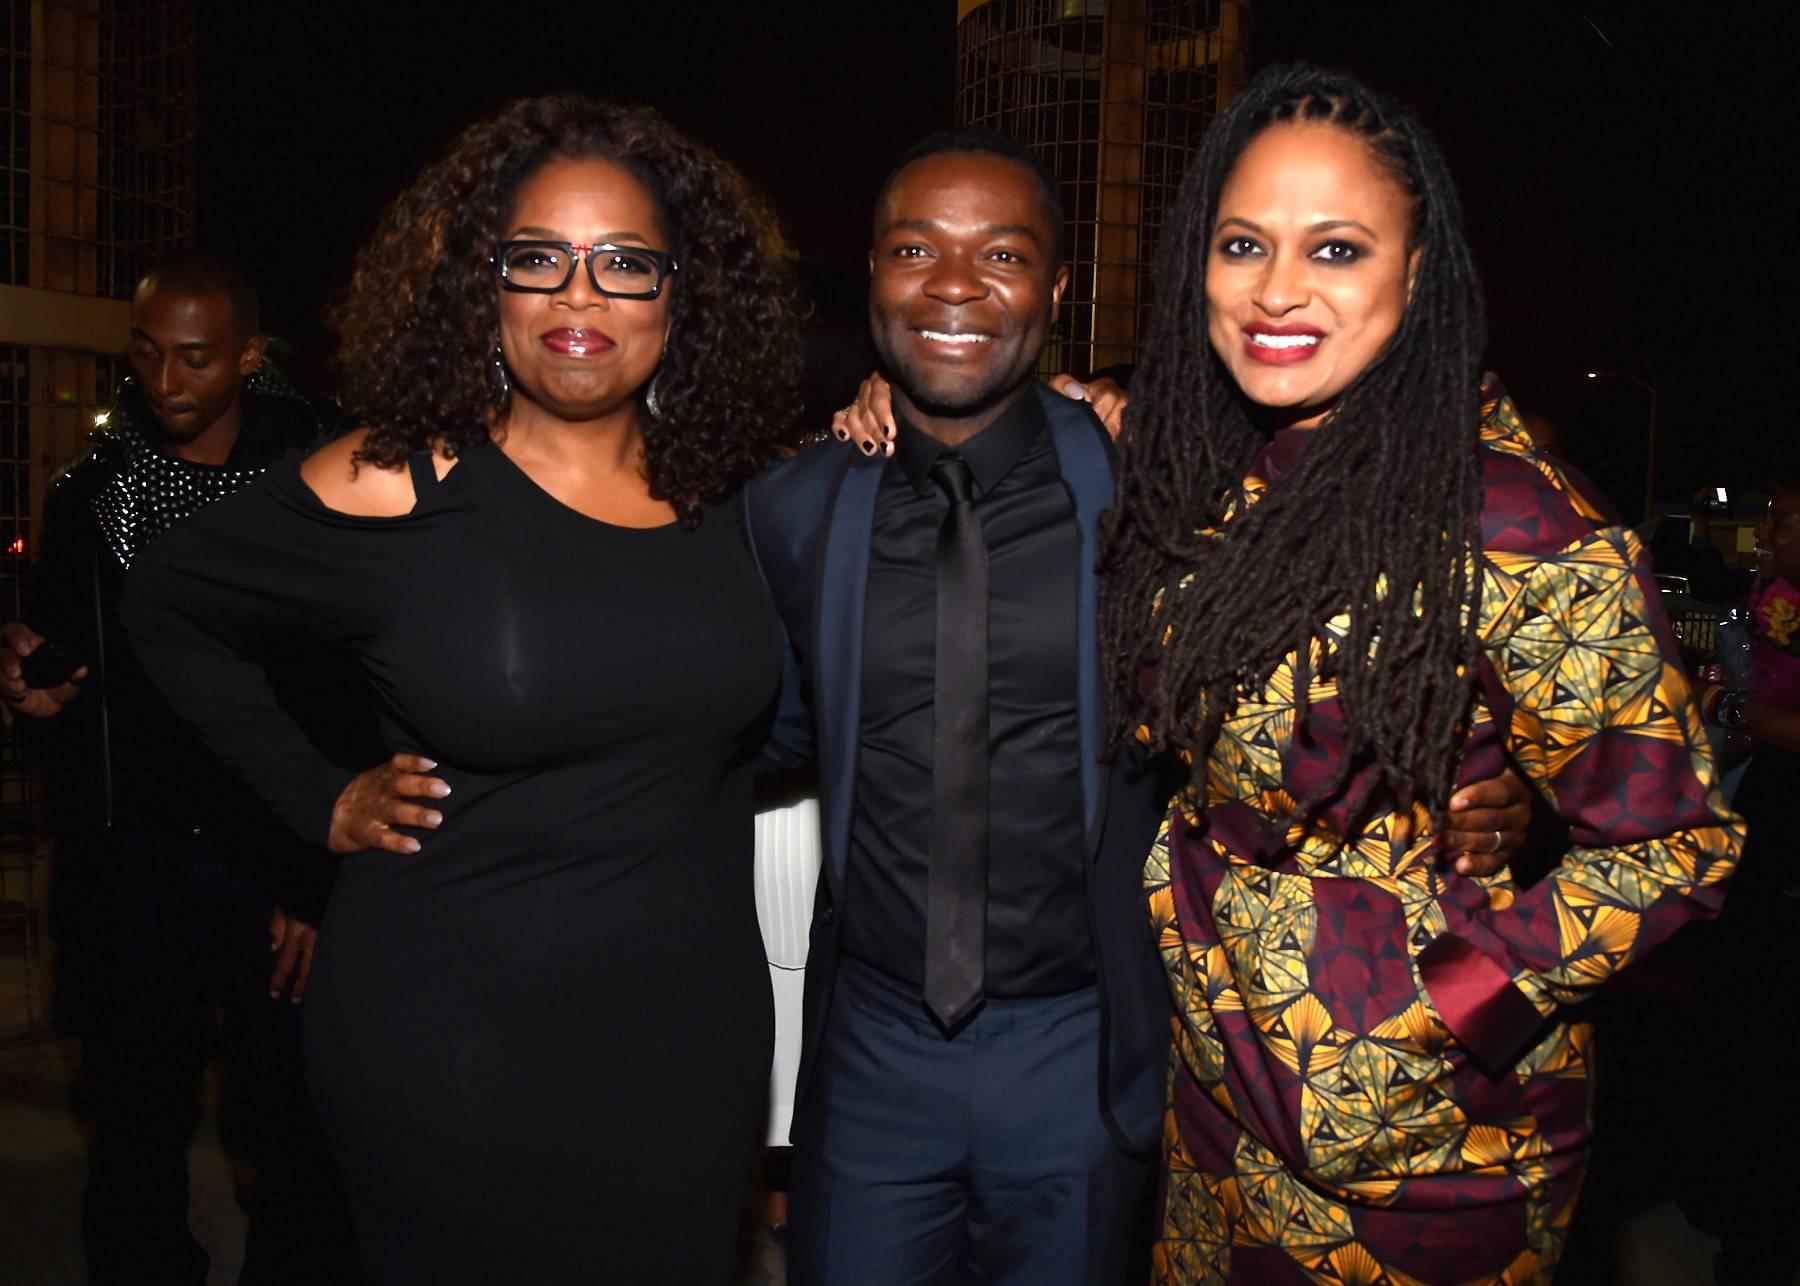 111214-celebs-out-Oprah-Winfrey-David-Oyelowo-Ava-DuVernay.jpg